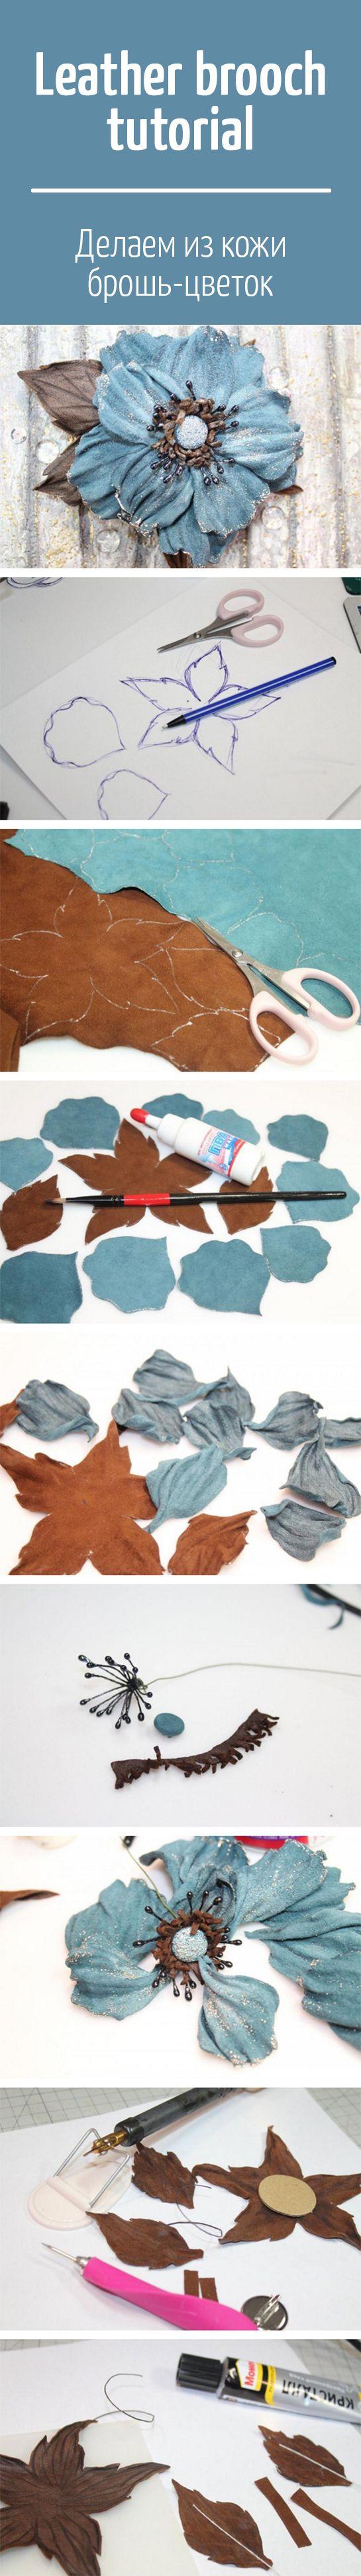 Leather brooch tutorial / Делаем из кожи брошь-цветок «Тиффани»